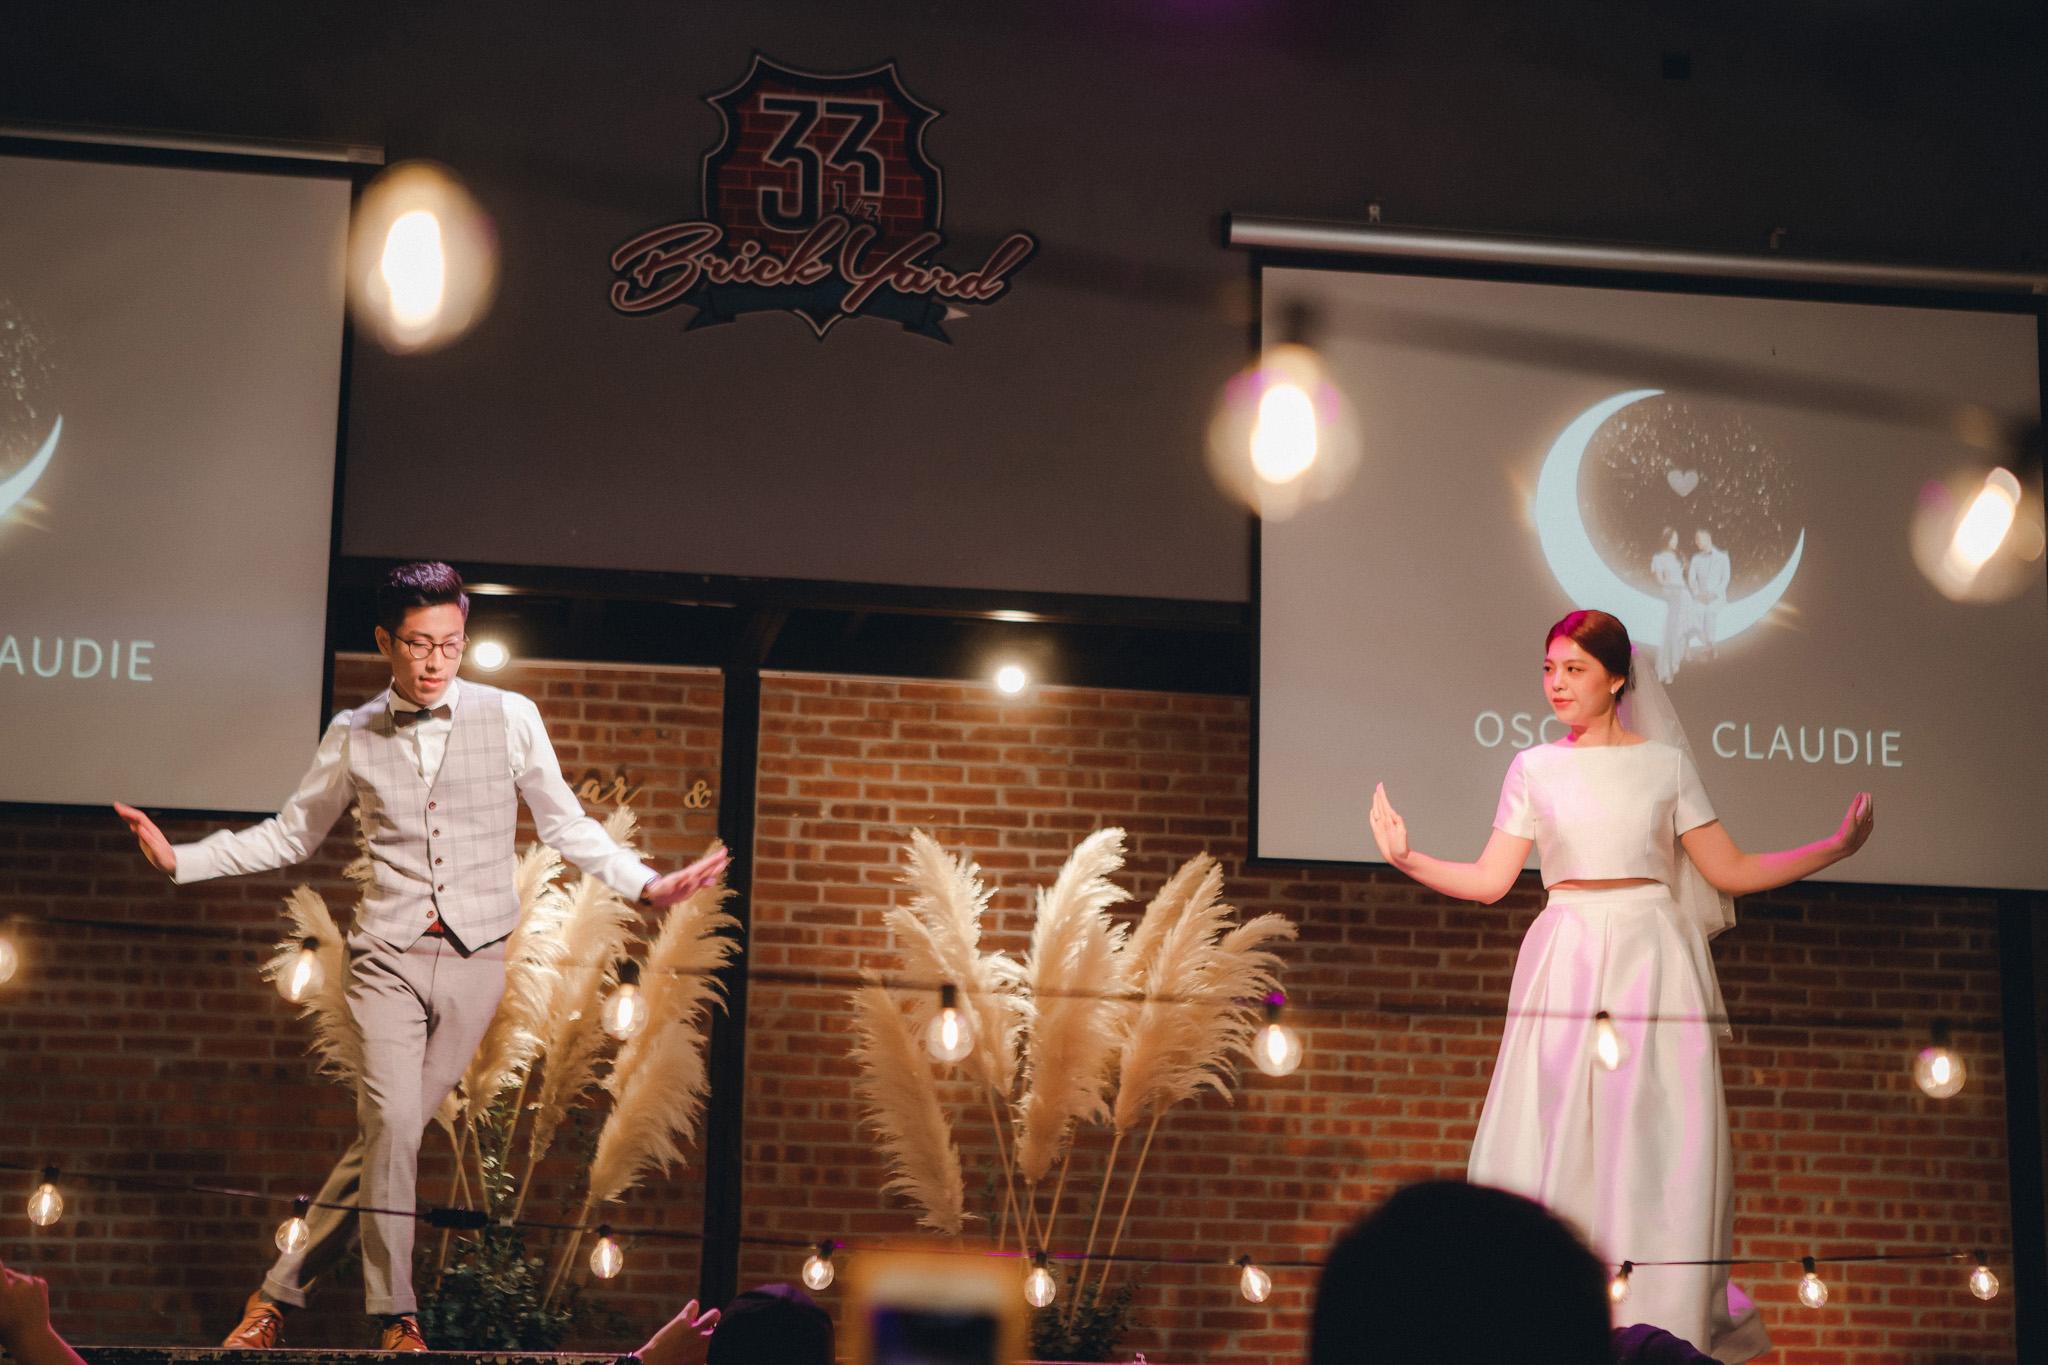 EW 台北婚攝 居米 濟南教會 Brick Yard 33 美軍俱樂部 婚禮 婚宴-70